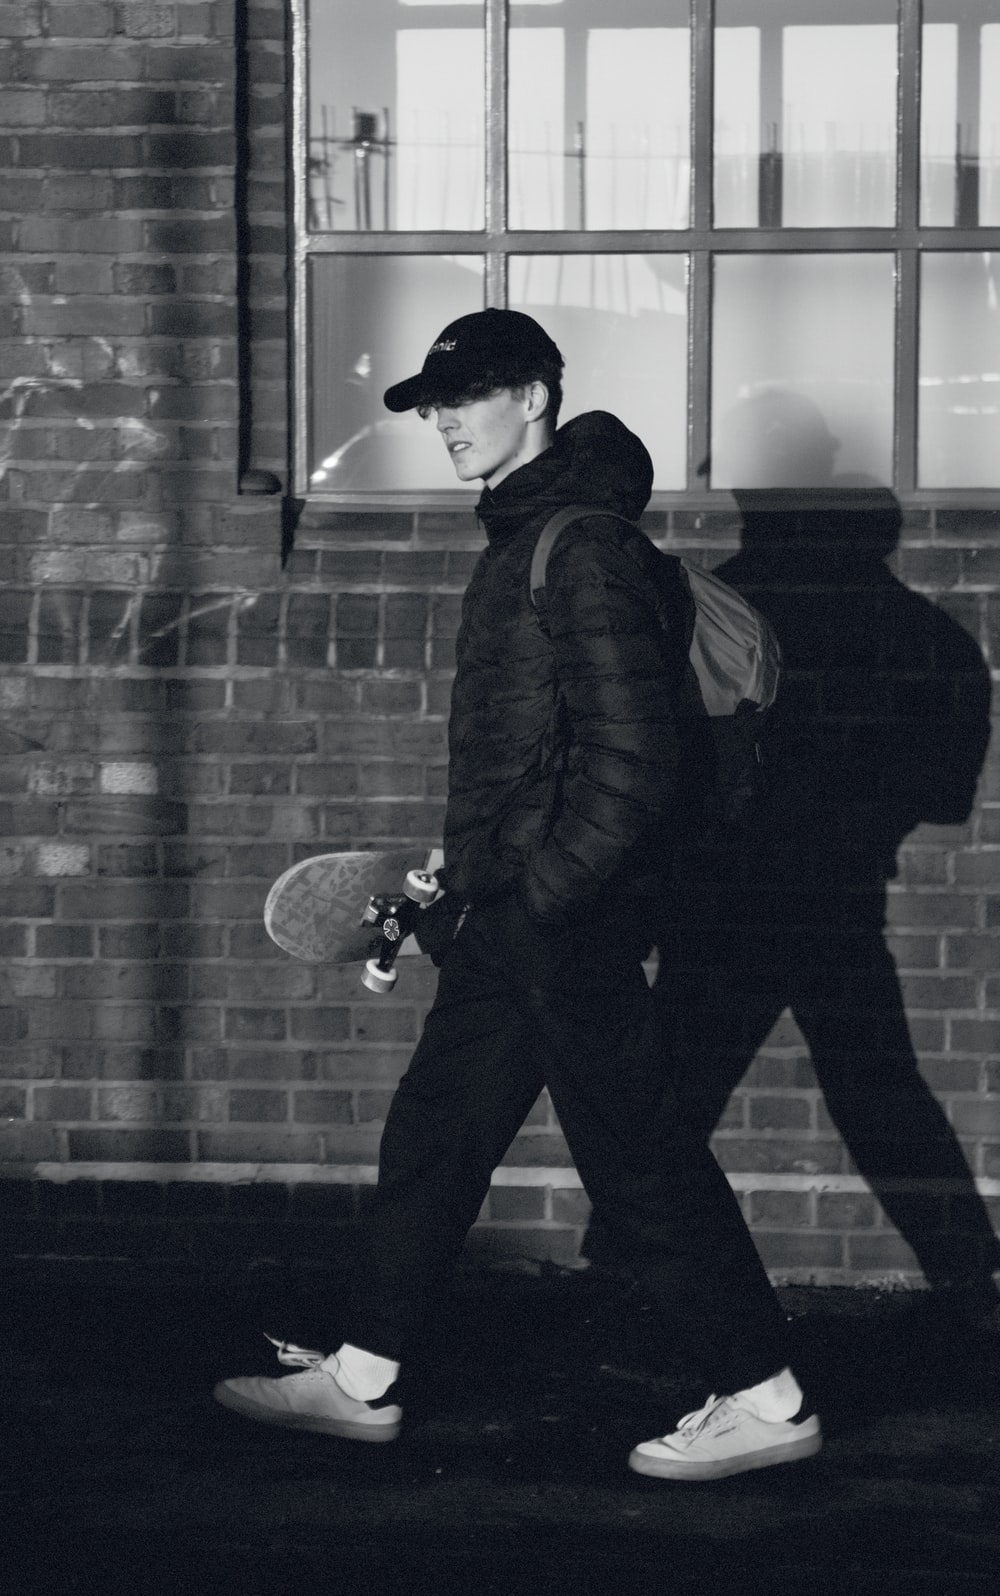 man in black jacket and black pants standing beside brick wall